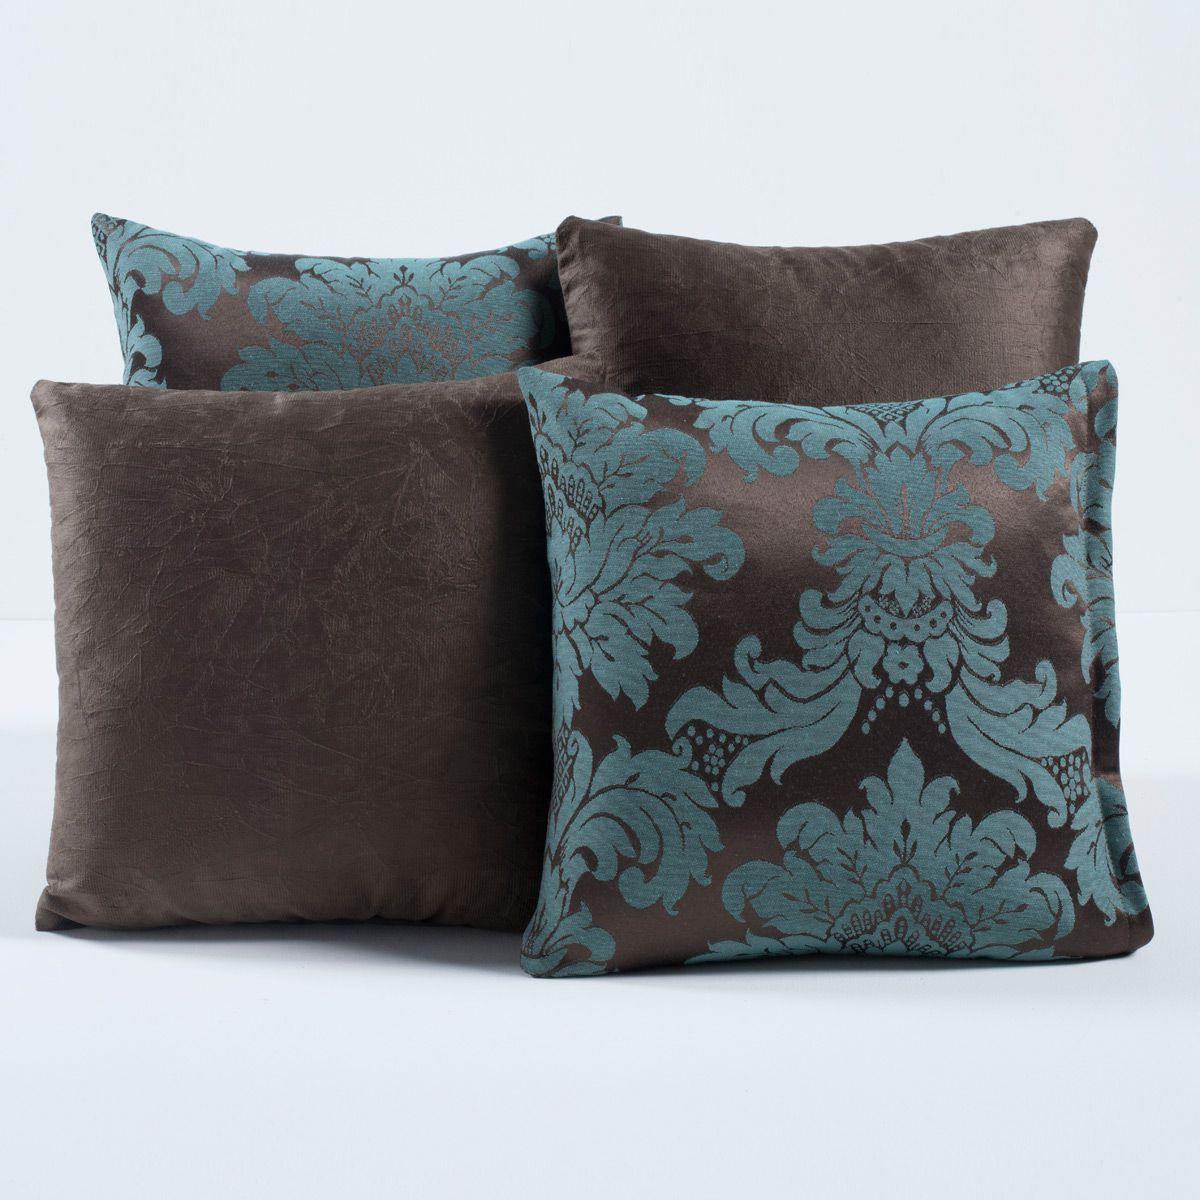 Kit Capas de Almofadas Decorativas Floral Tabaco/Tiffany 04 Peças